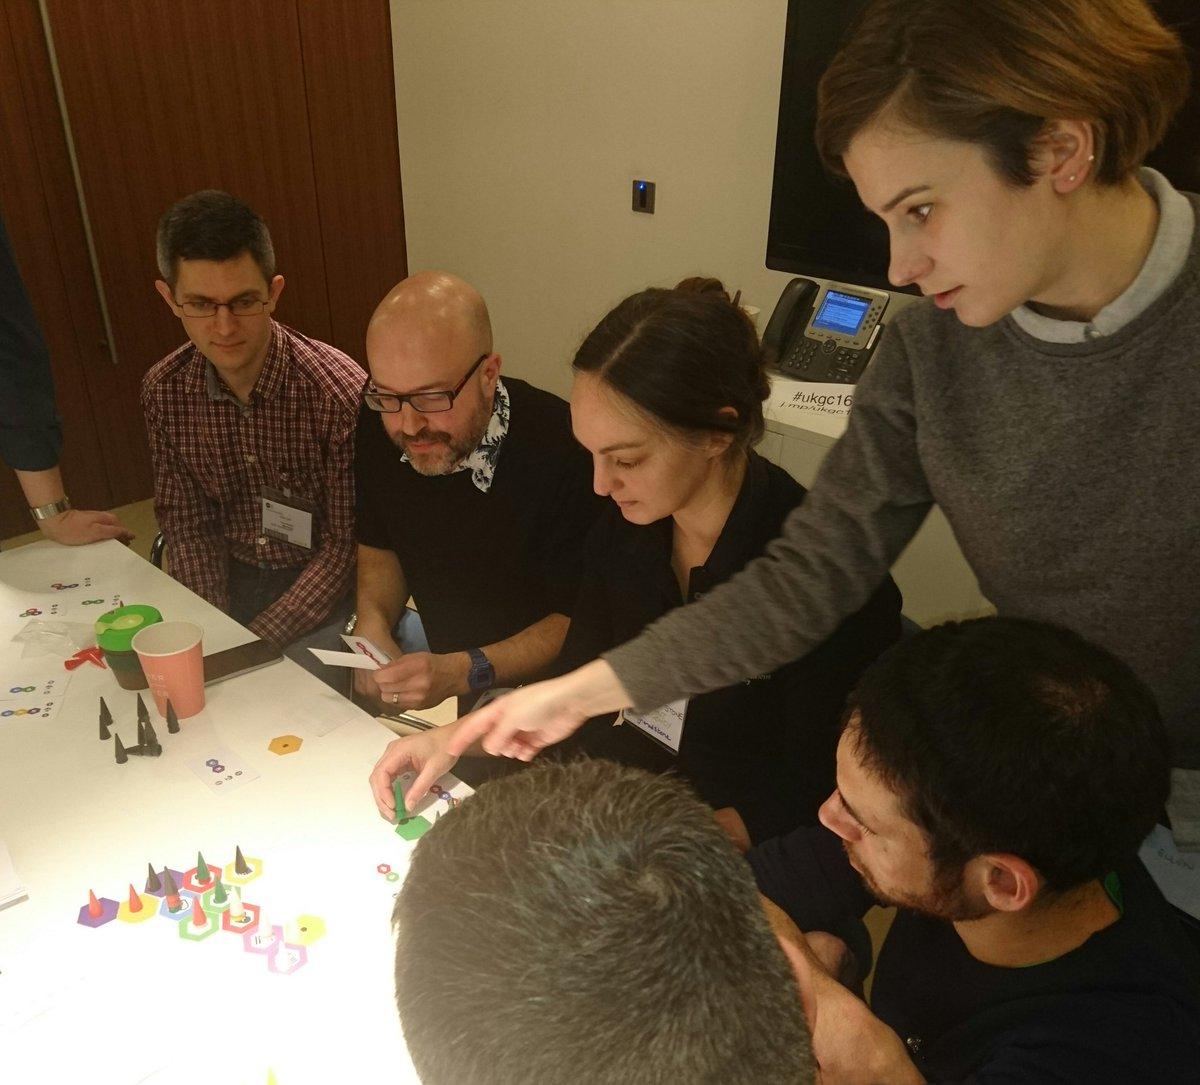 @_datasmith & @AngharadStone playing the @ODIHQ (@ellenbroad & @JeniT) #OpenData board game #ukgc16 #ukgc16s2rg2 https://t.co/ghQJkvLuVX